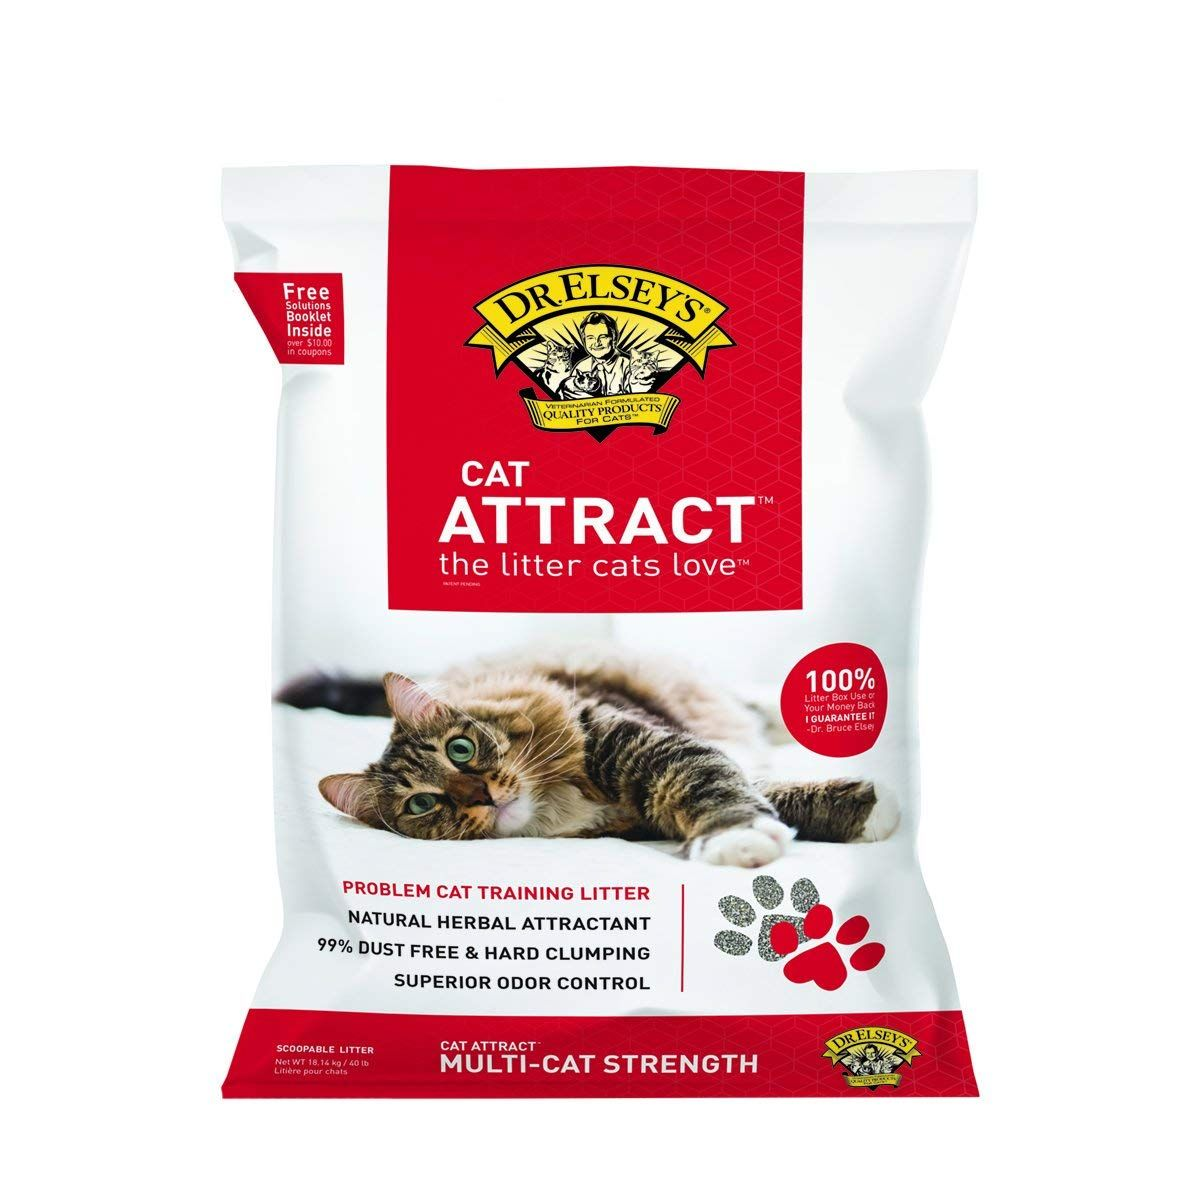 Dr elseys cat attract problem cat training litter